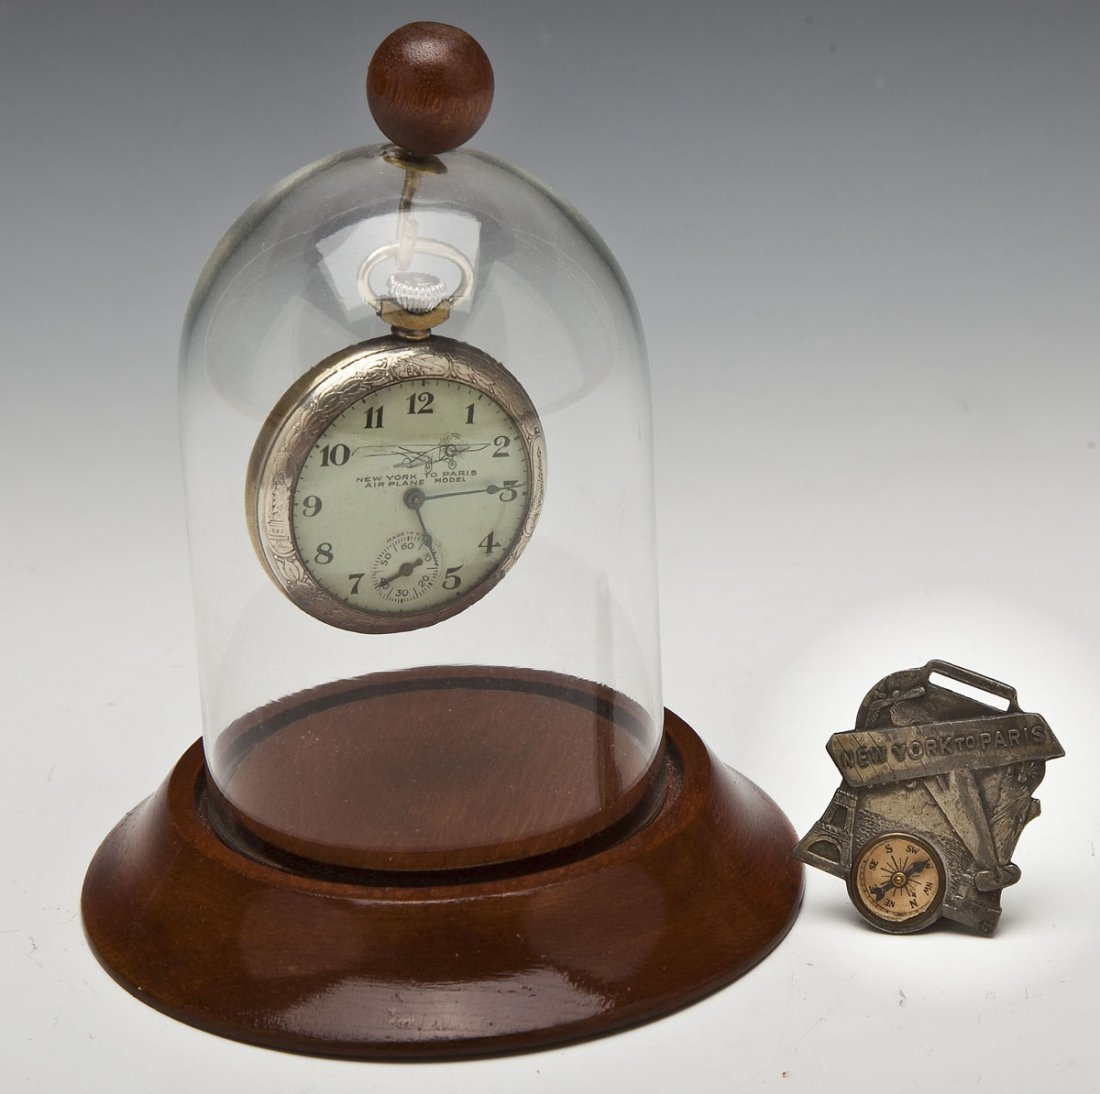 Charles Lindbergh Pocket Watch & Fob